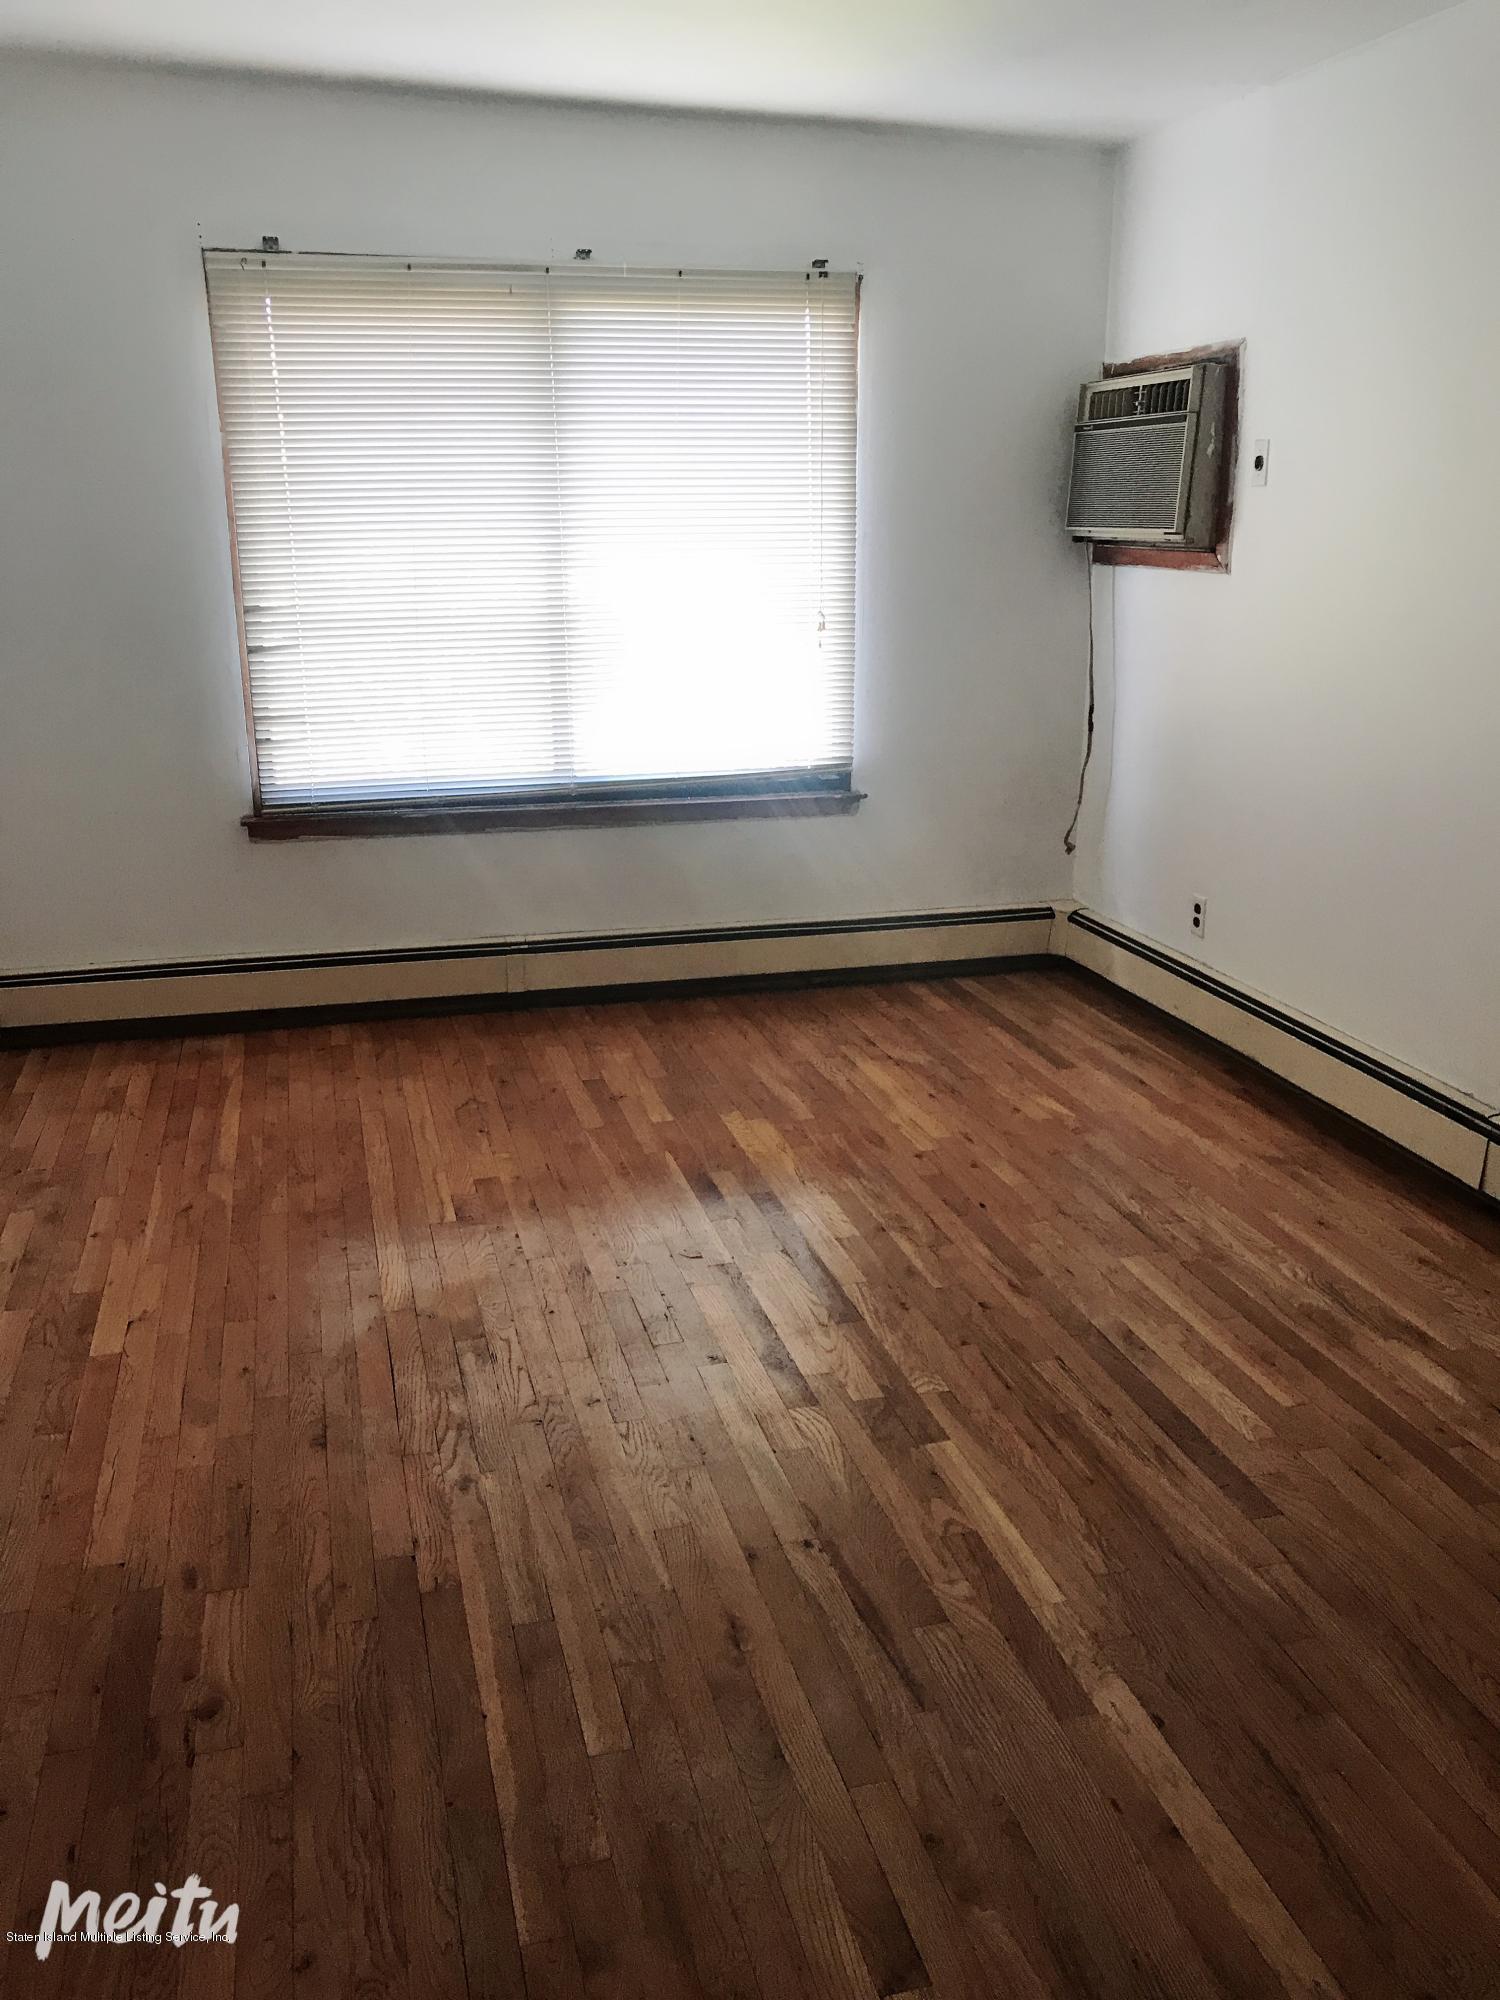 Single Family - Semi-Attached 129 Moreland Street  Staten Island, NY 10306, MLS-1129862-6